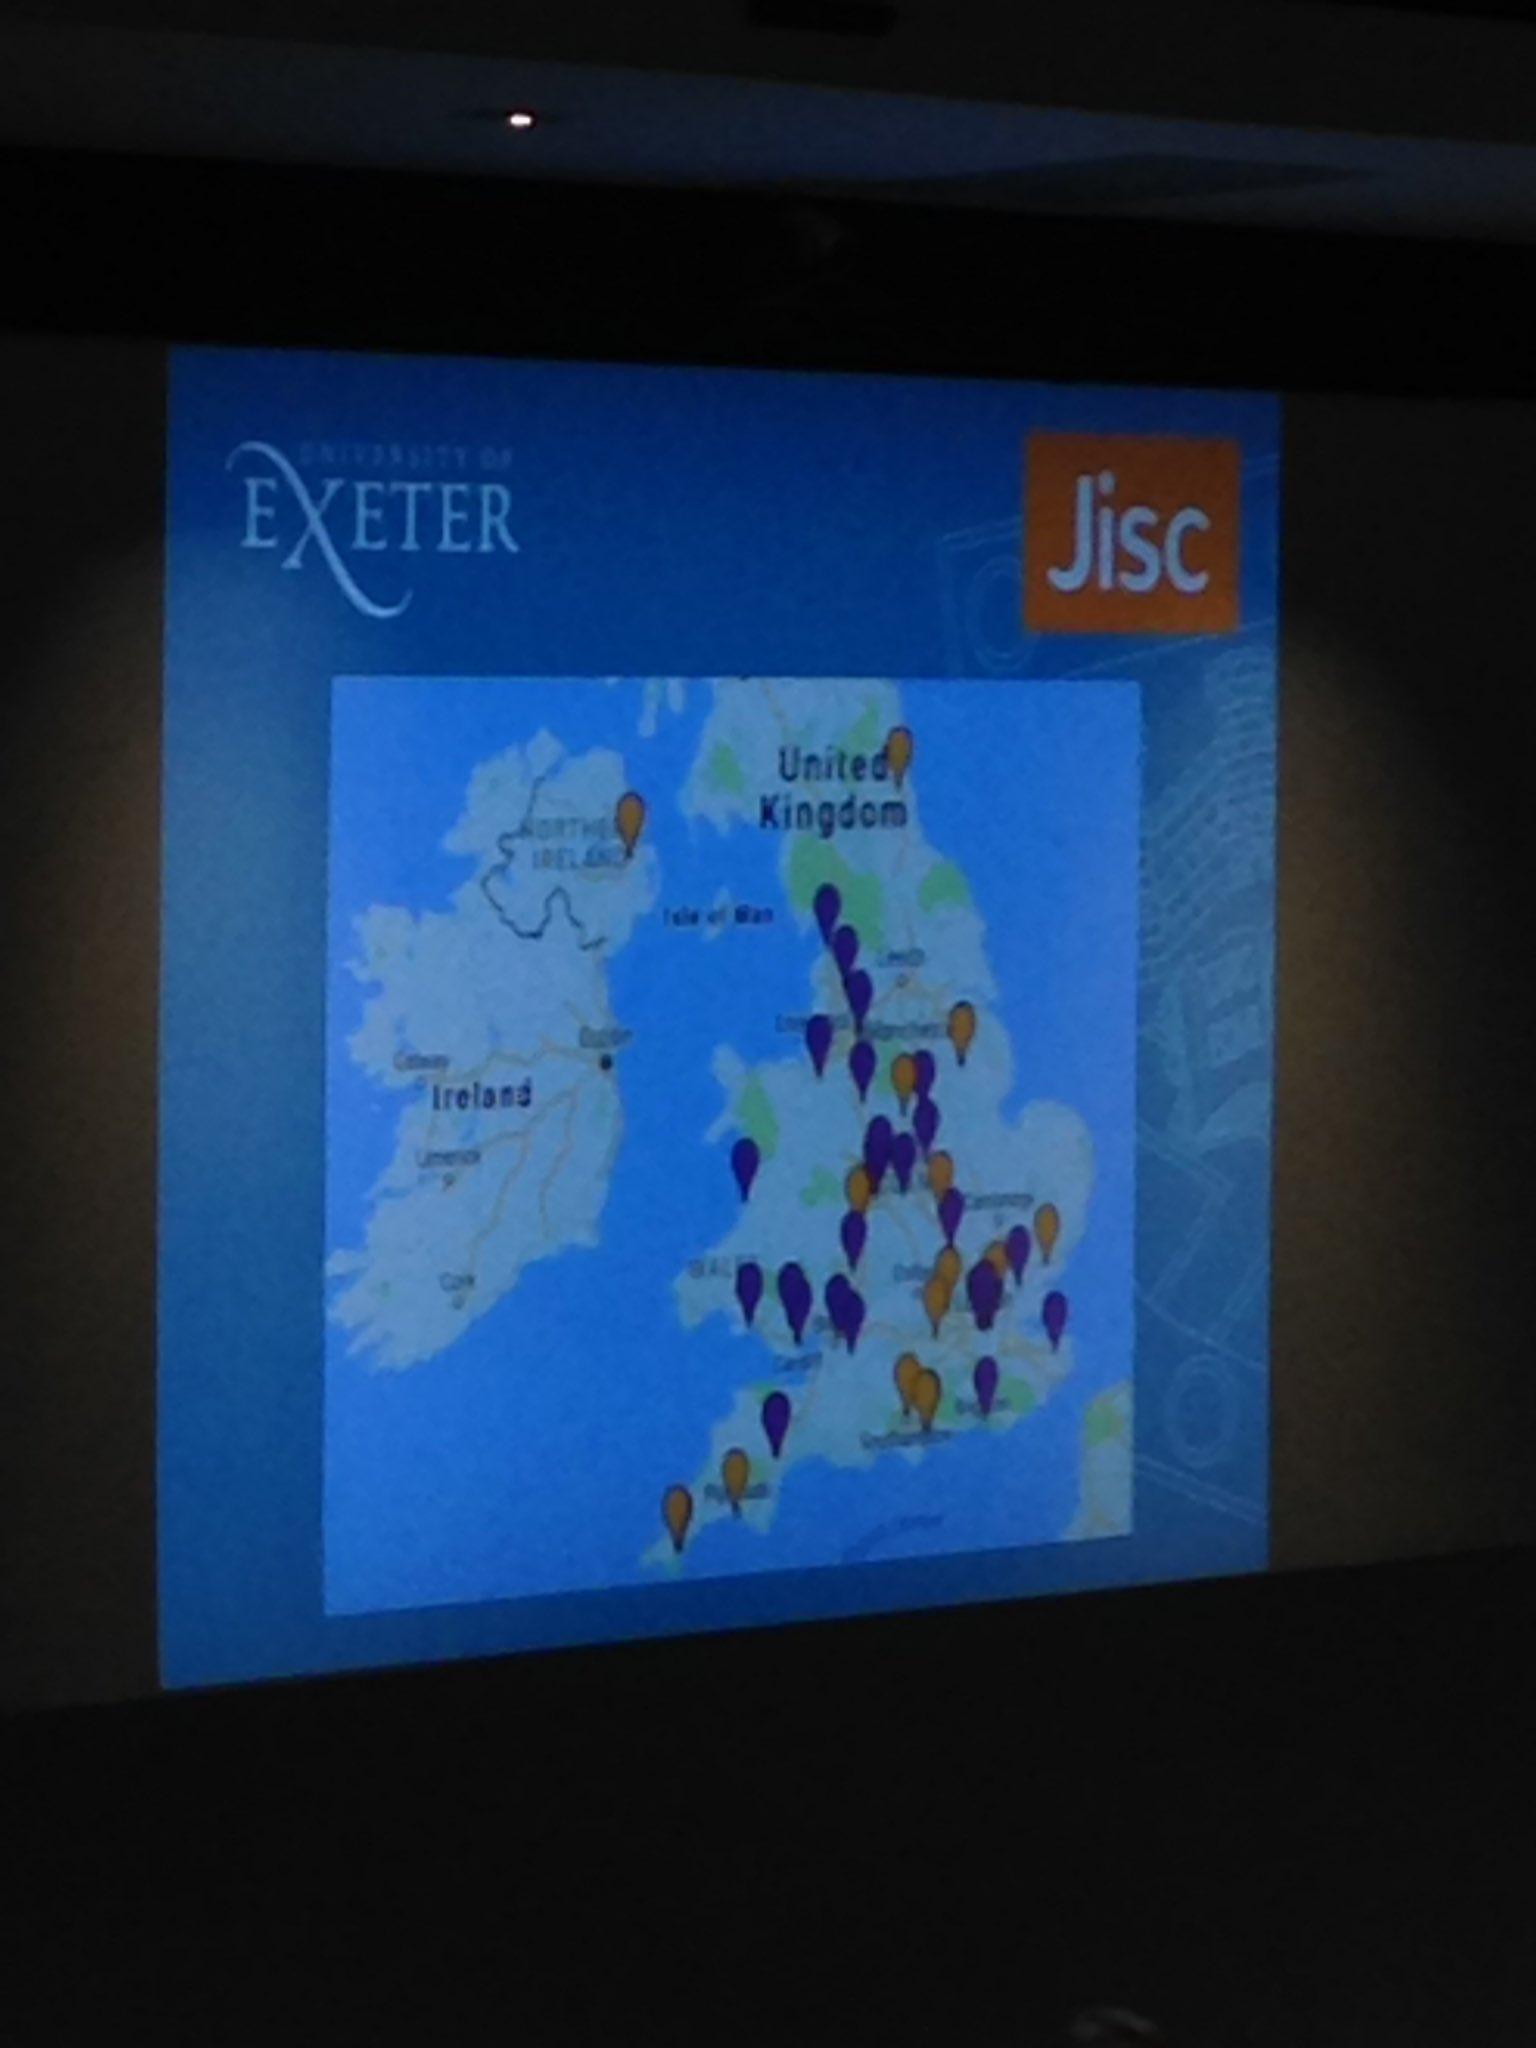 Loving the interactive map. Look @HibberdJake, four different Welsh Universities! #dontforgetWalesagain #JiscCAN17 https://t.co/KTpkAY5xV1